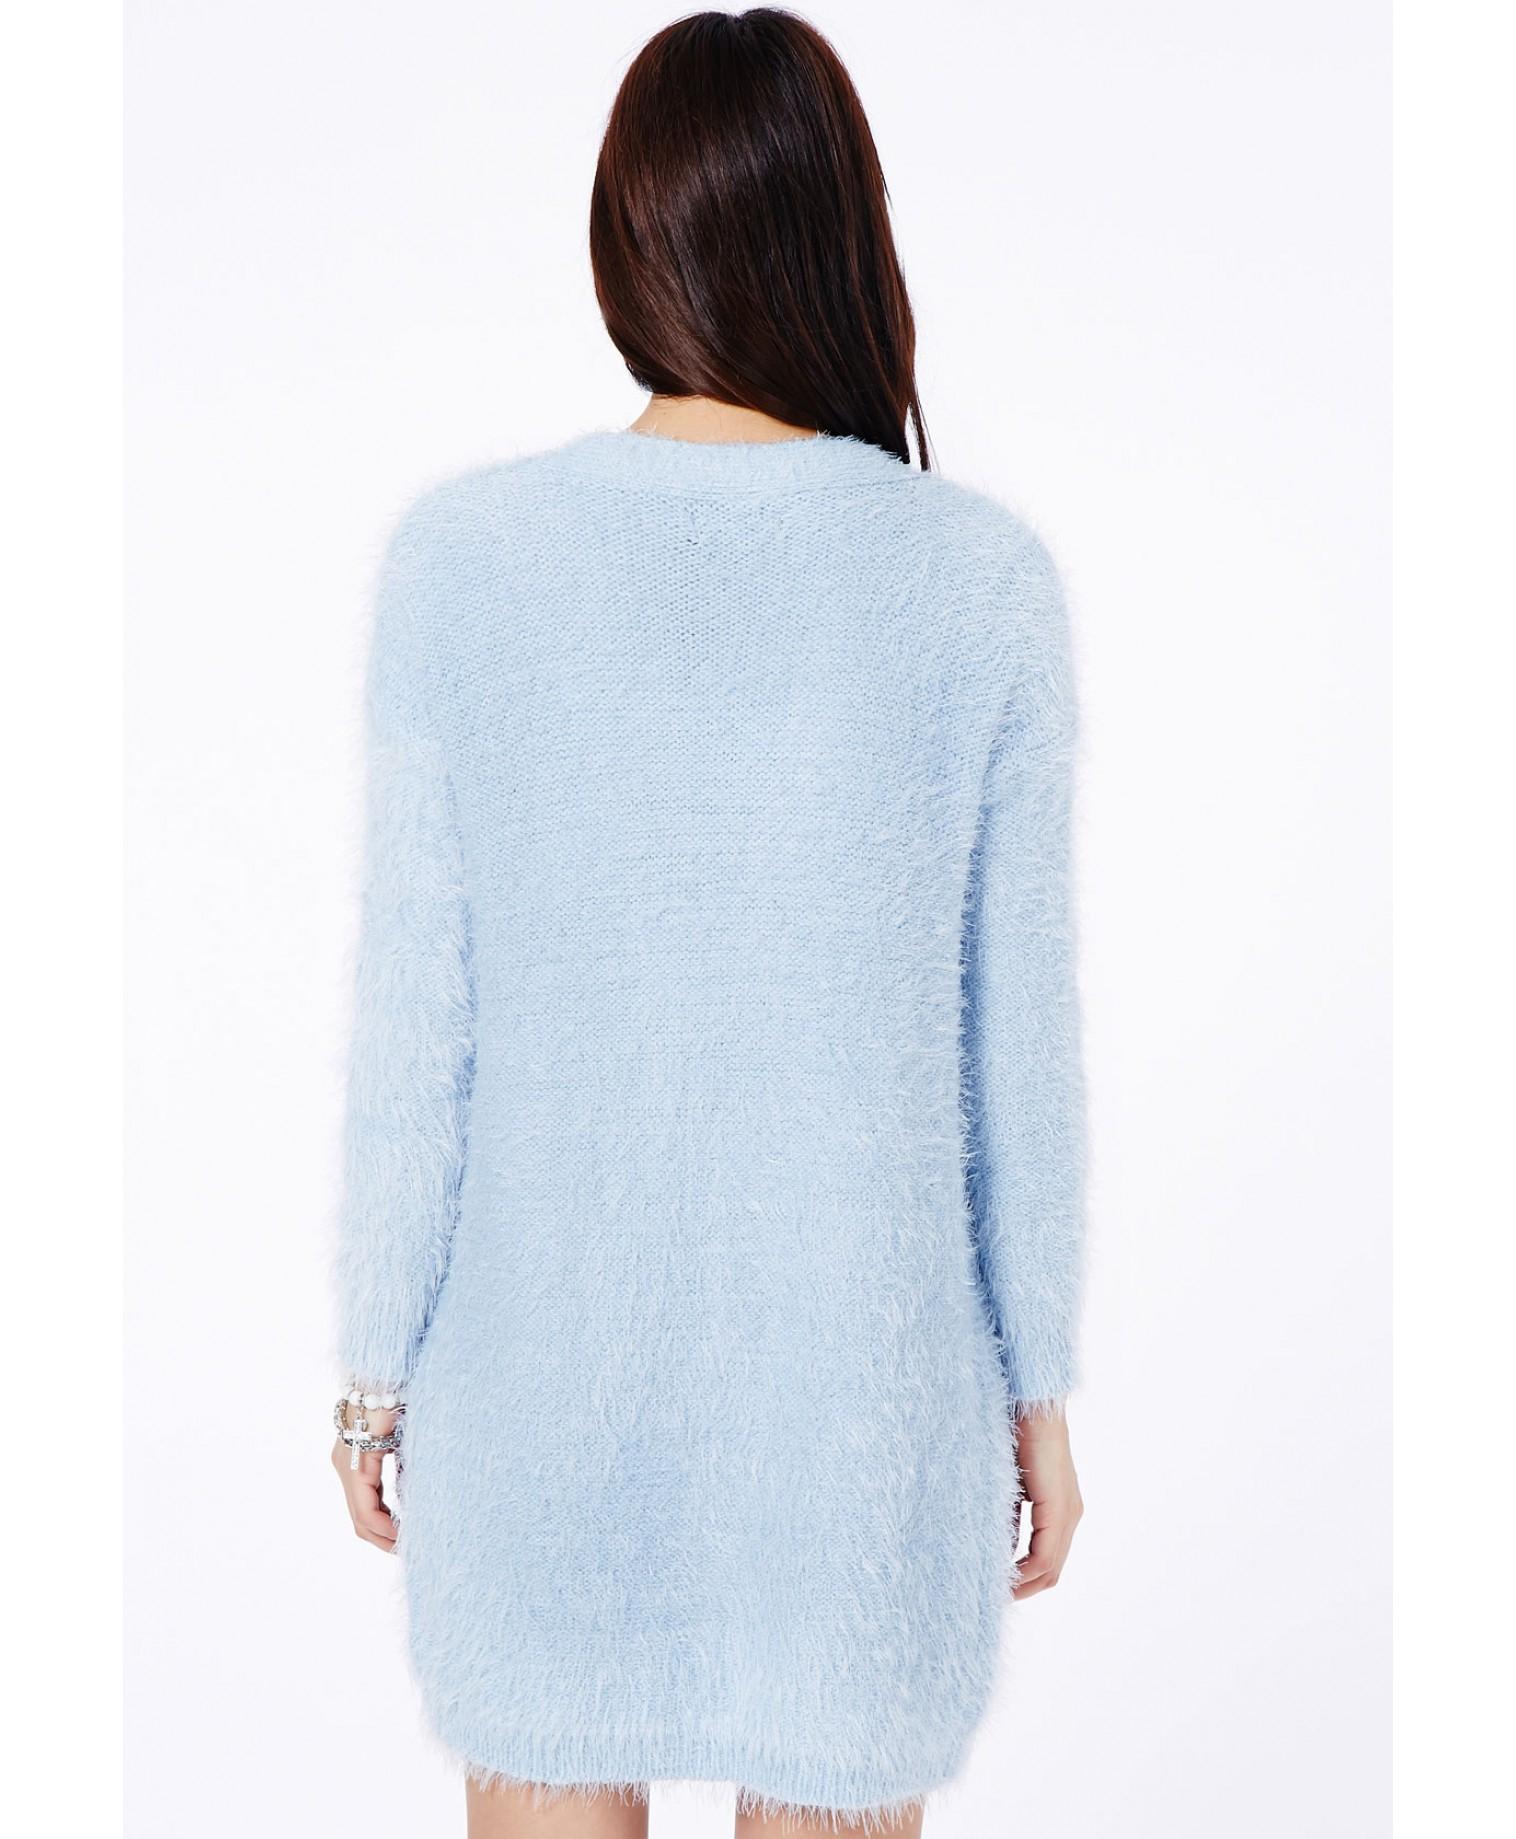 30750cfe12f3 Lyst - Missguided Satomi Eyelash Knit Cardigan in Baby Blue in Blue